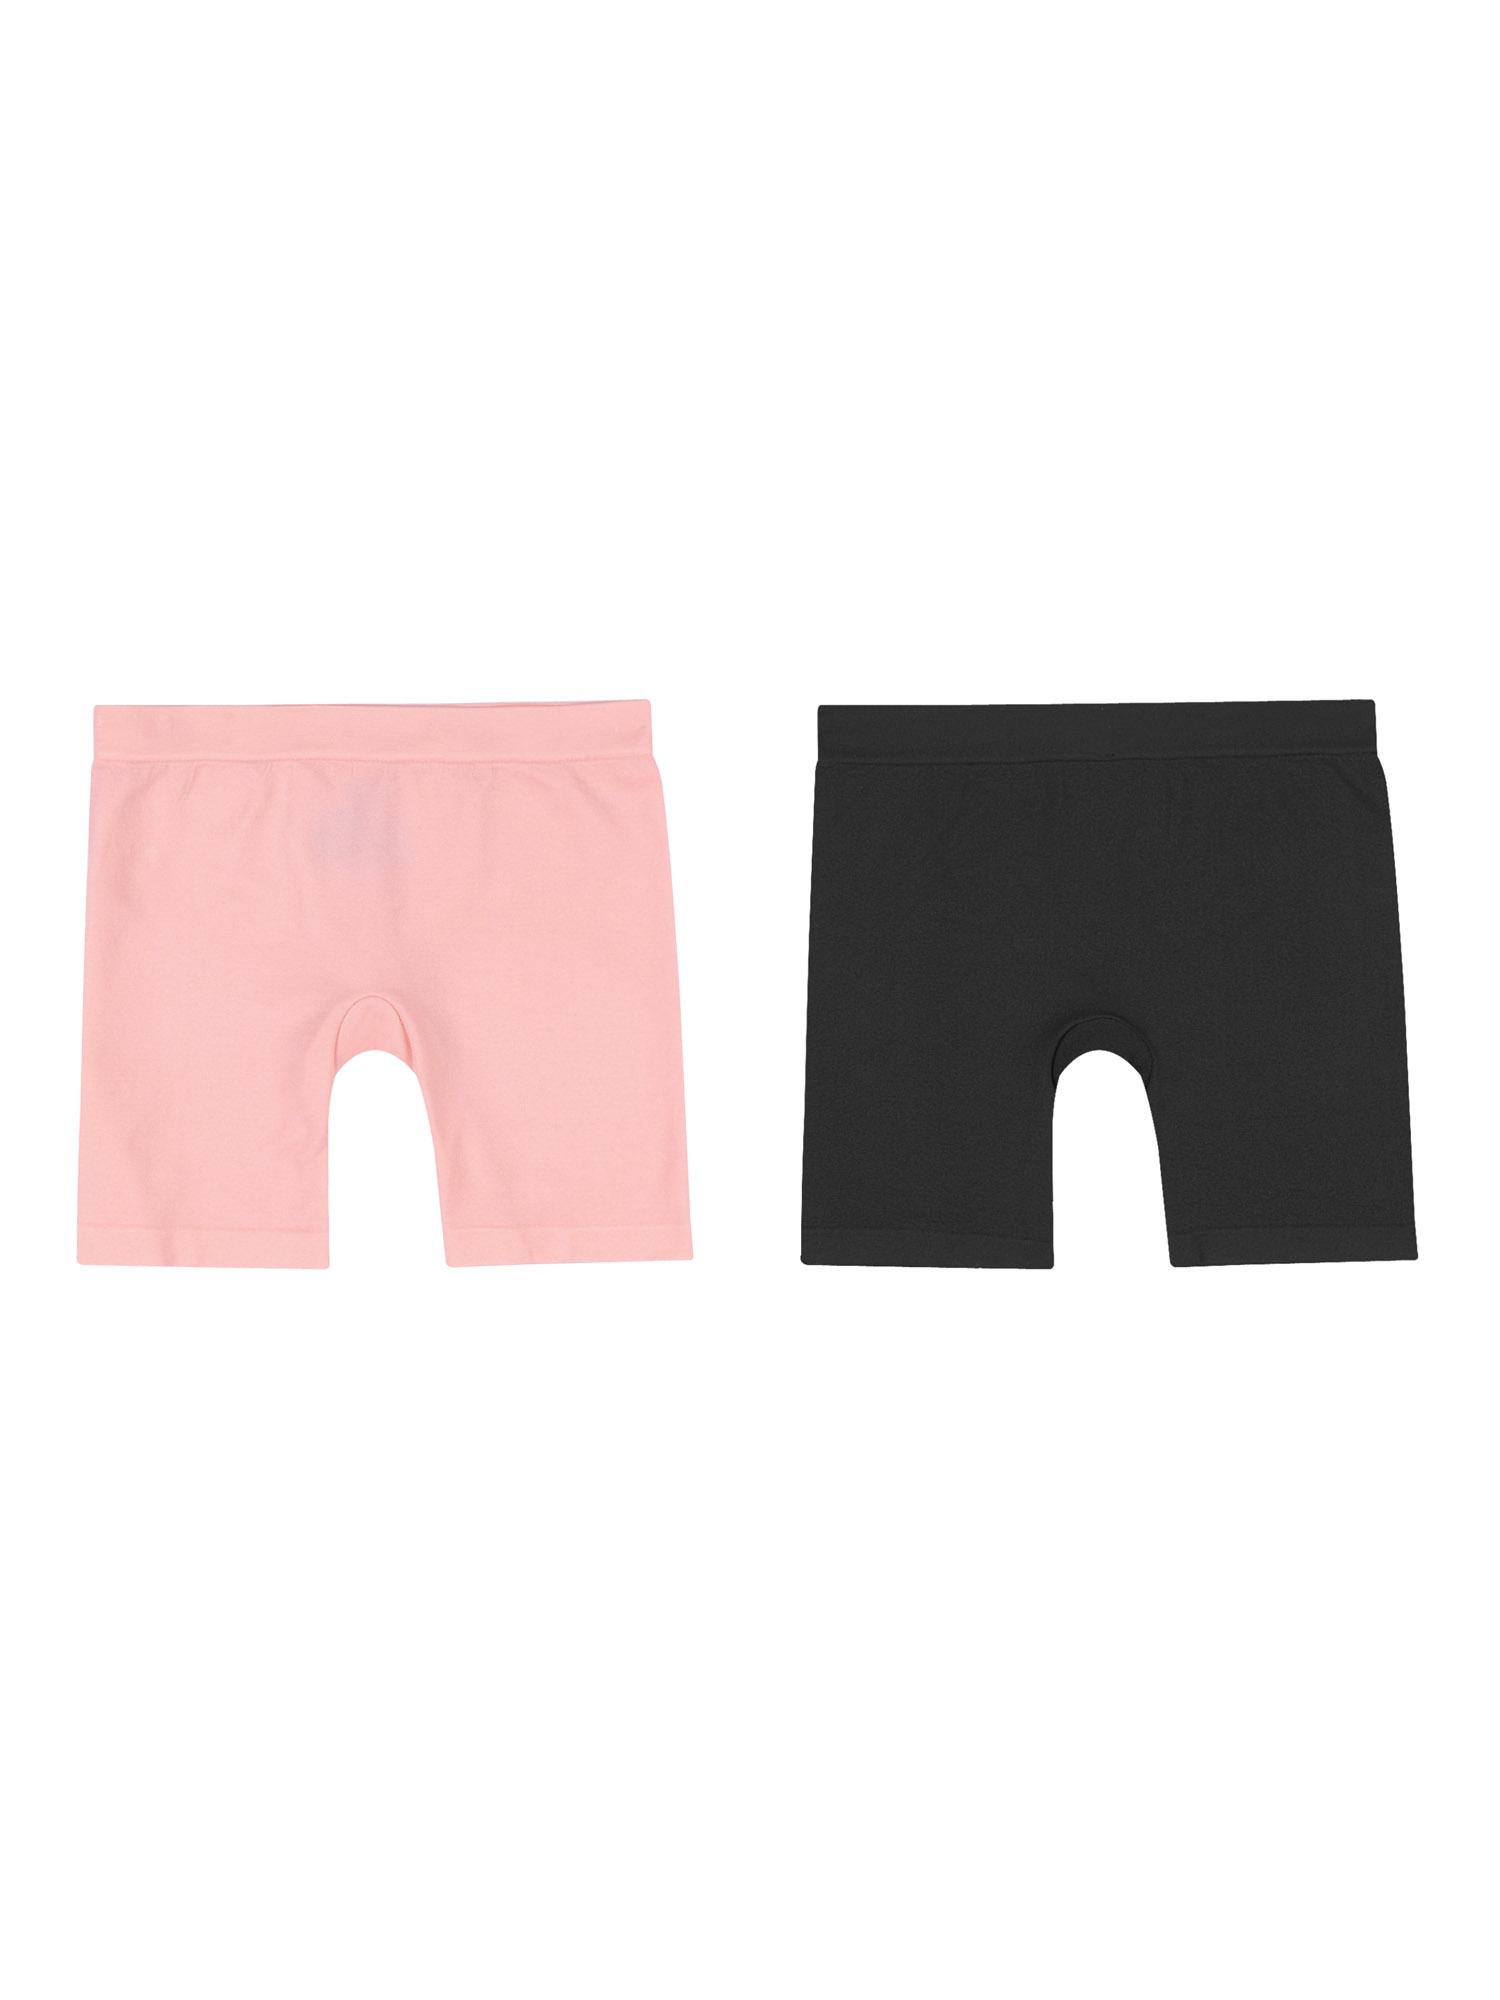 Hanes Girls' Play Short 2 pack